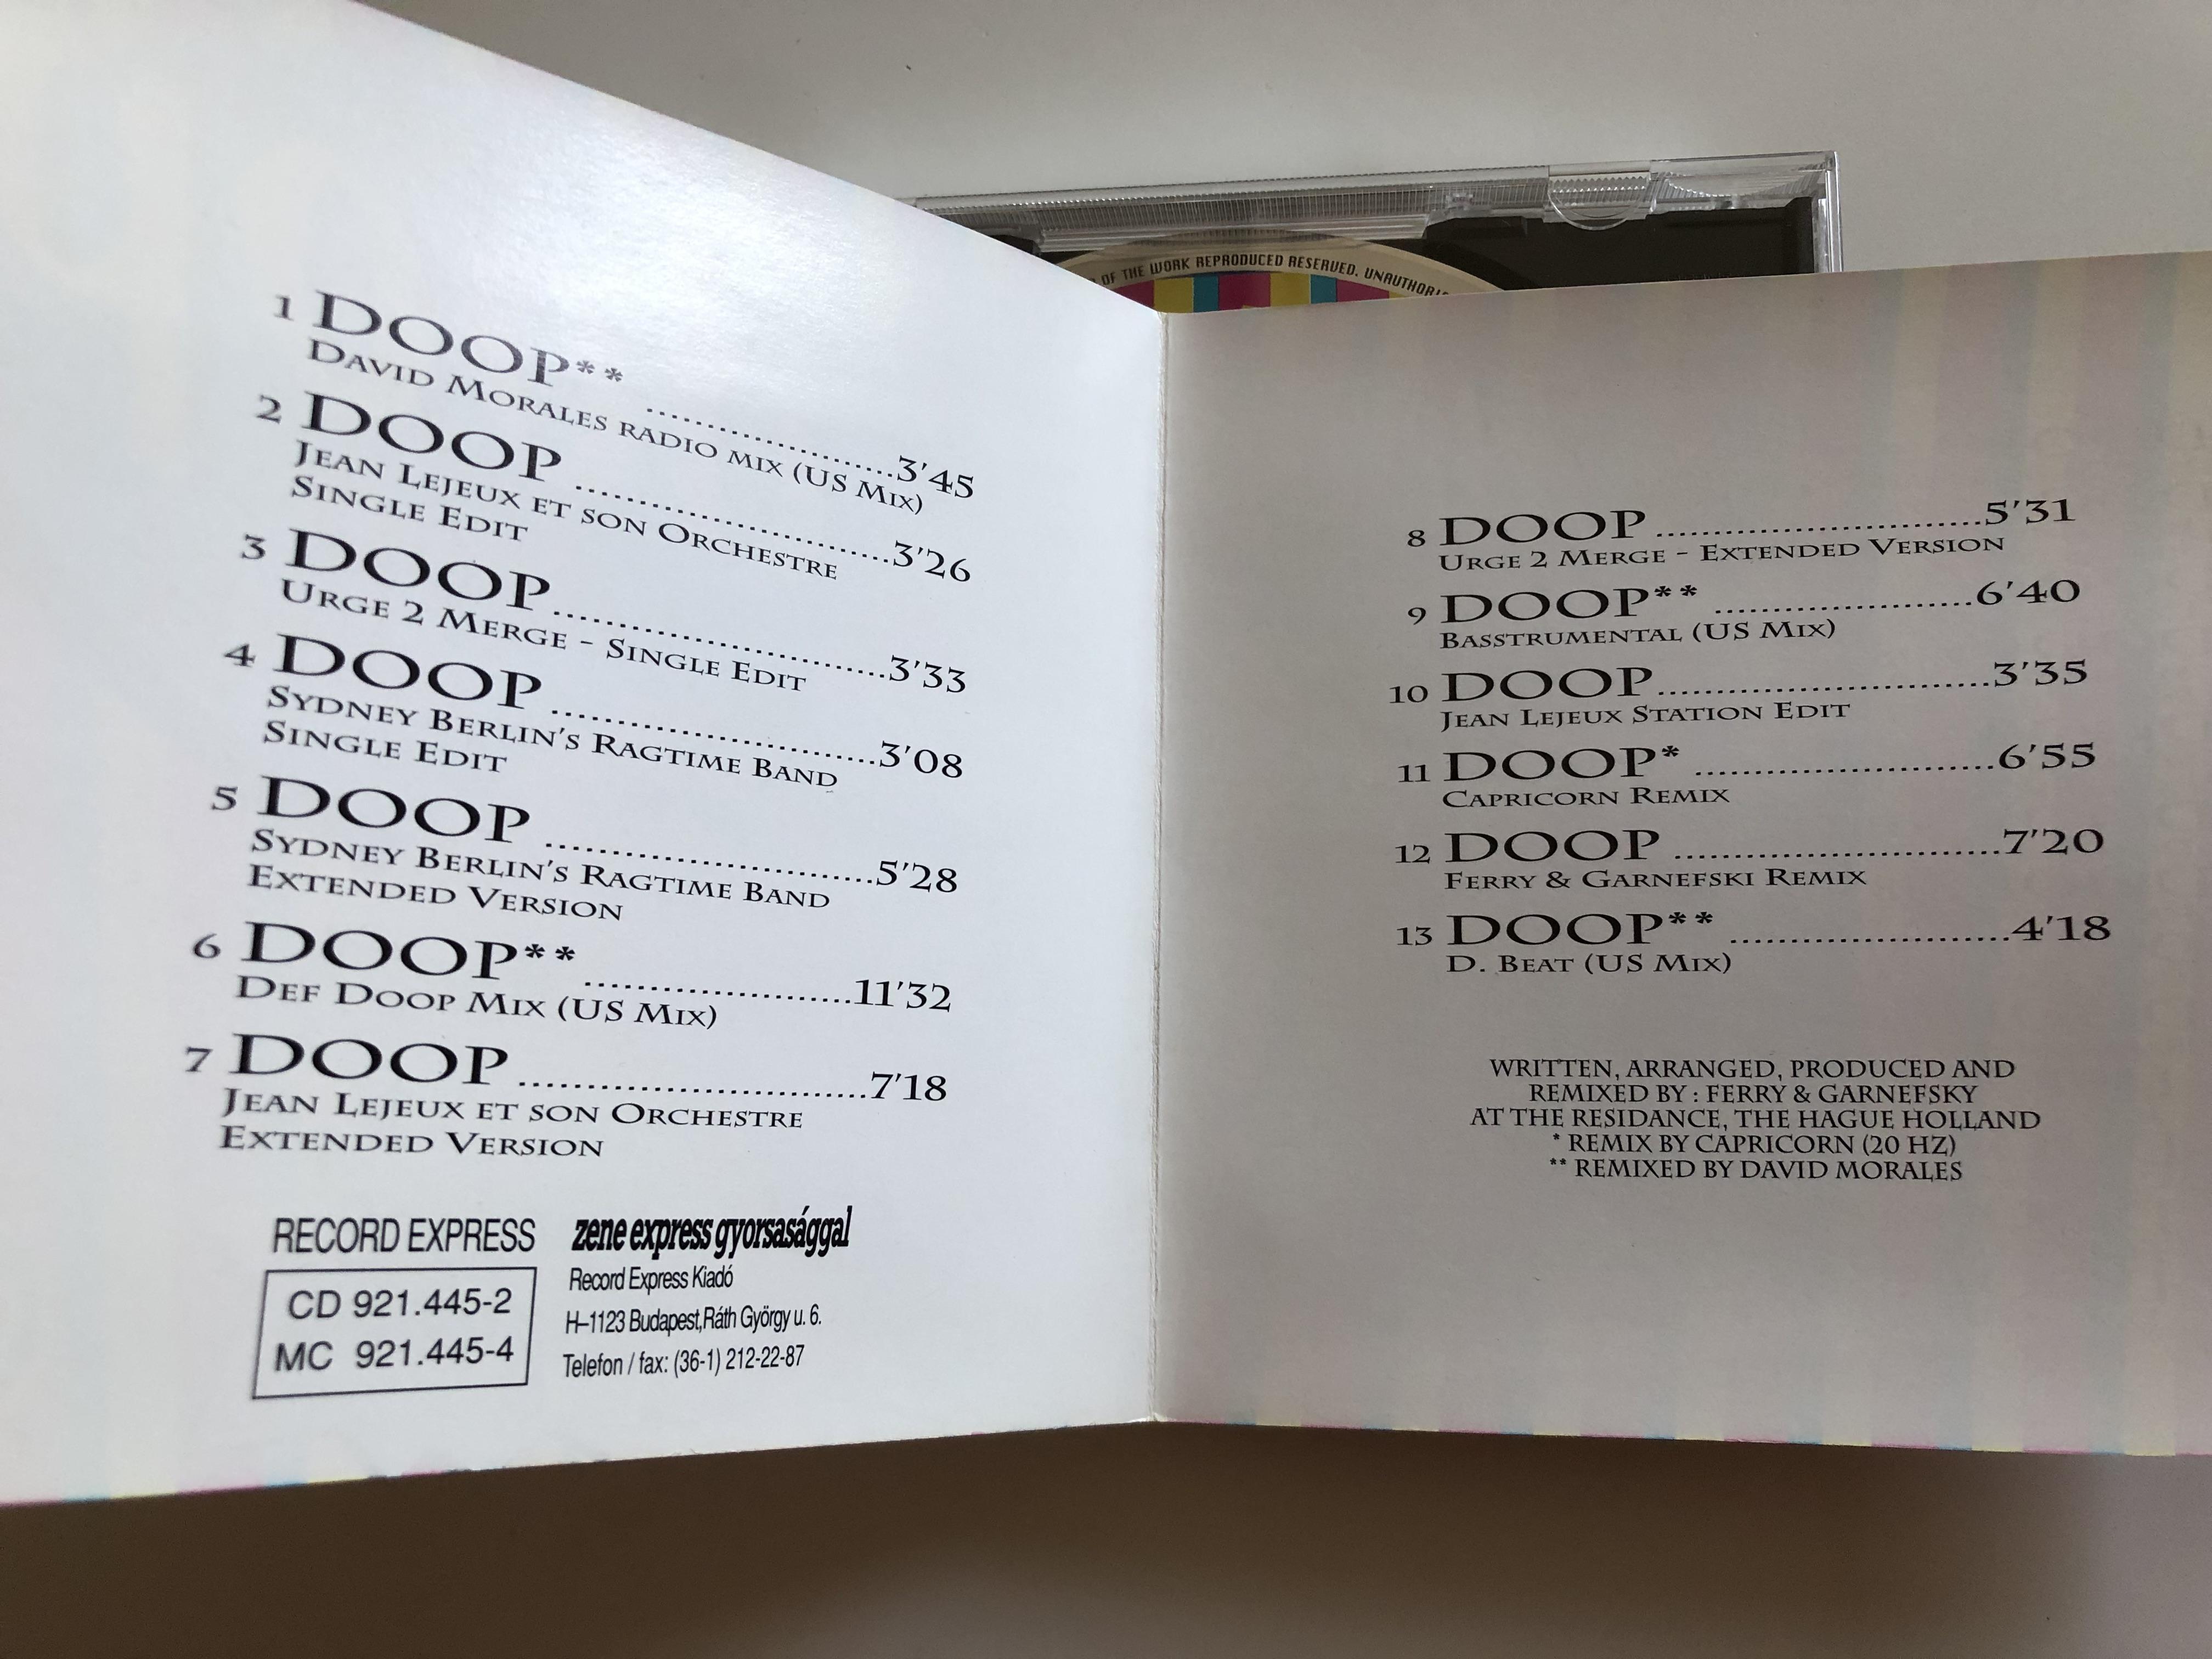 doop-doop-maniaimg-4563.jpg